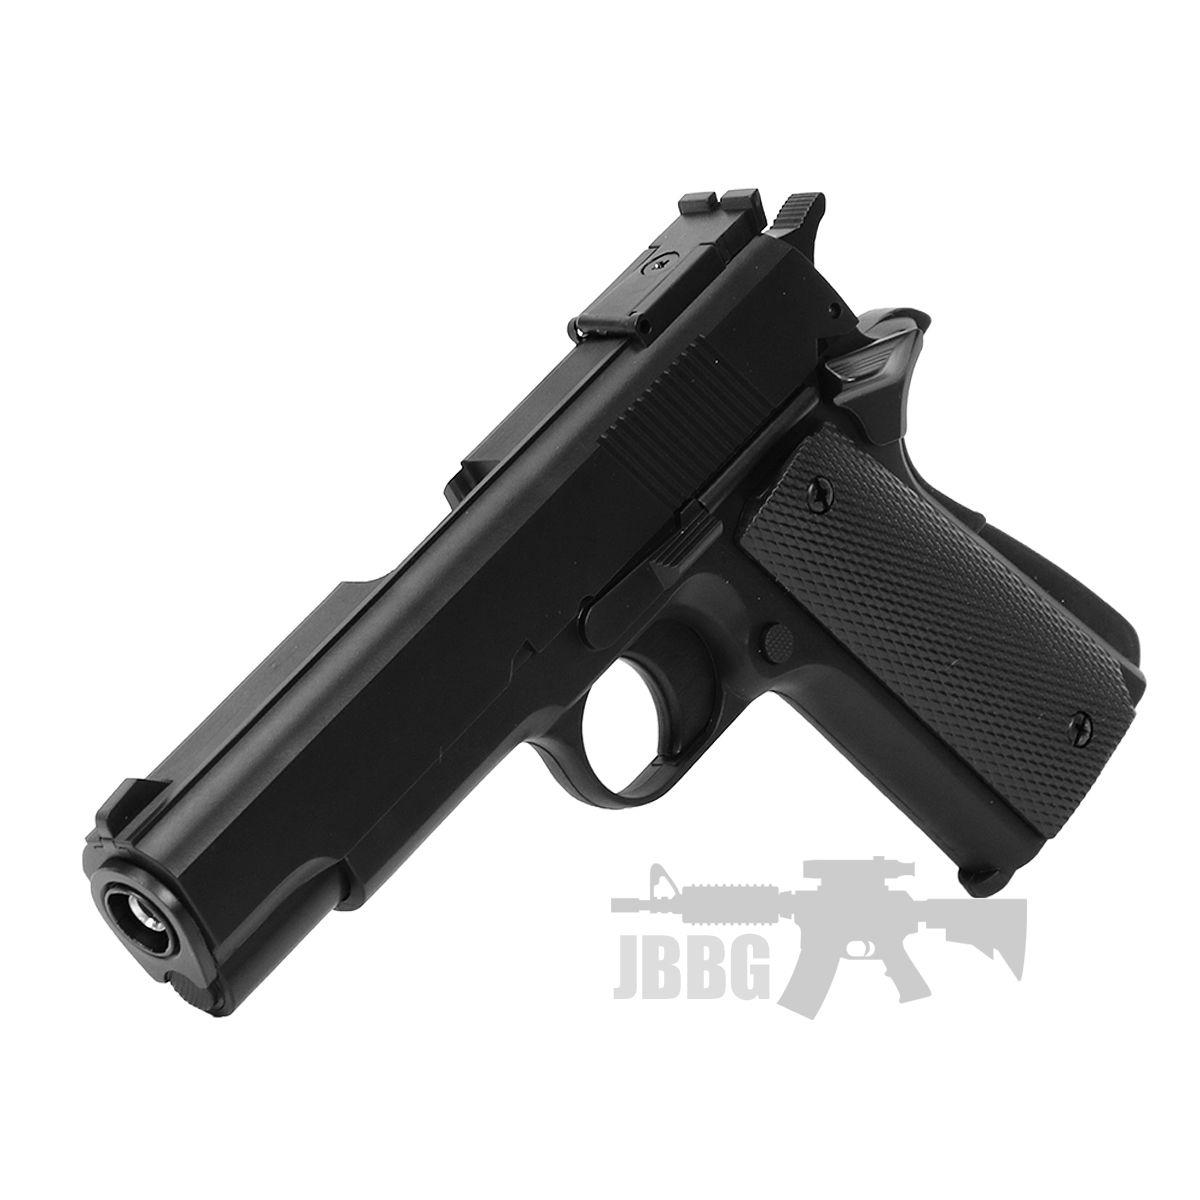 hg123 gas airsoft pistol 5